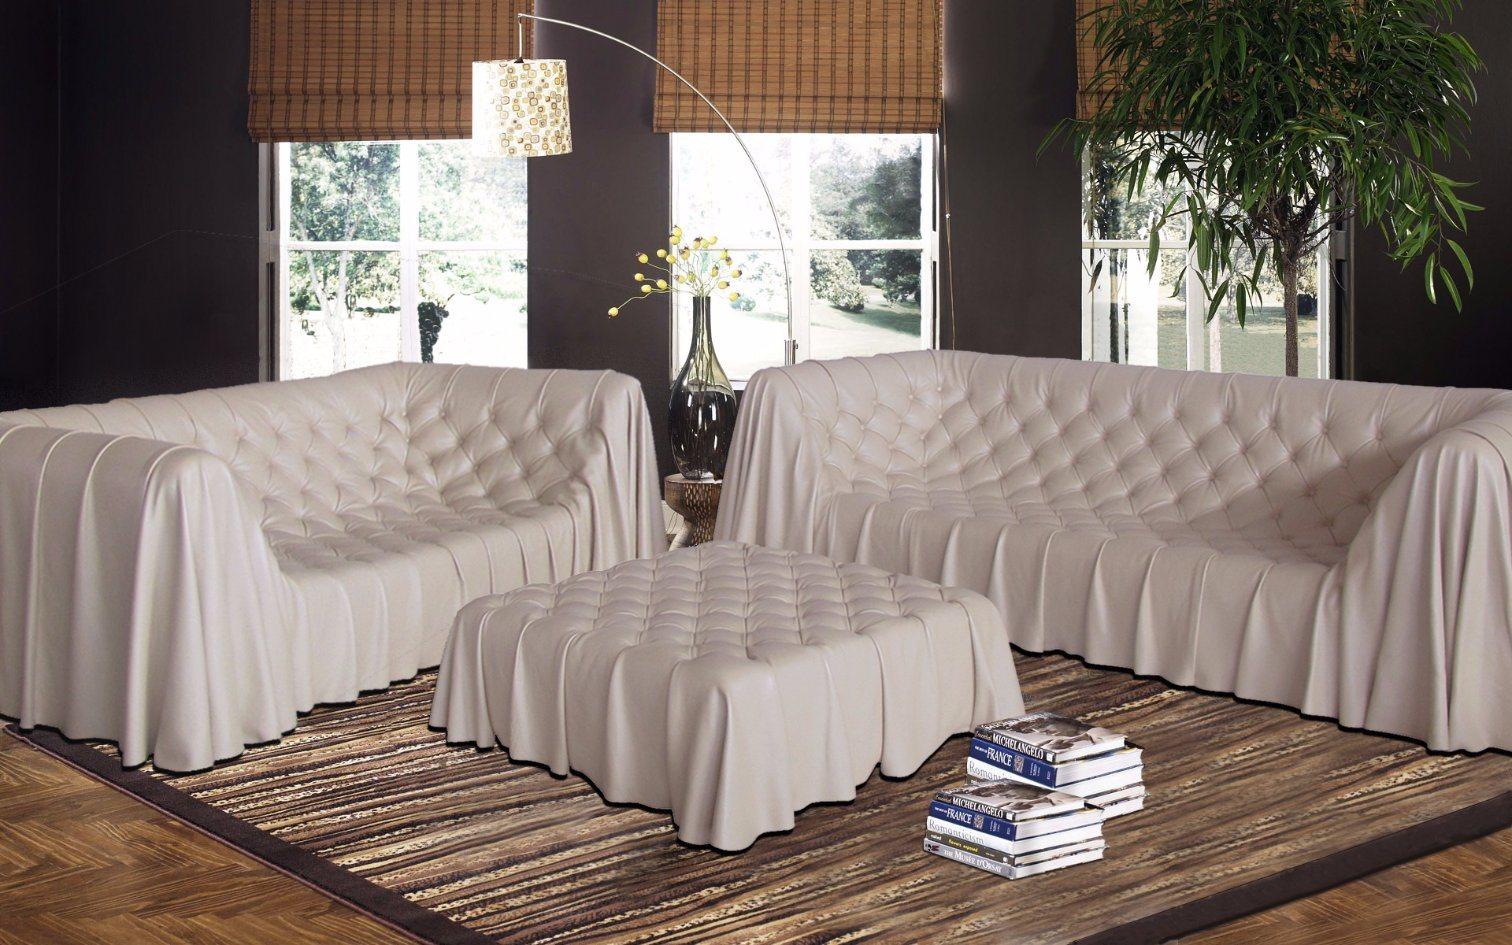 Enjoyable Hot Item Original Italian Design Nubuck Leather Sofa Ocoug Best Dining Table And Chair Ideas Images Ocougorg